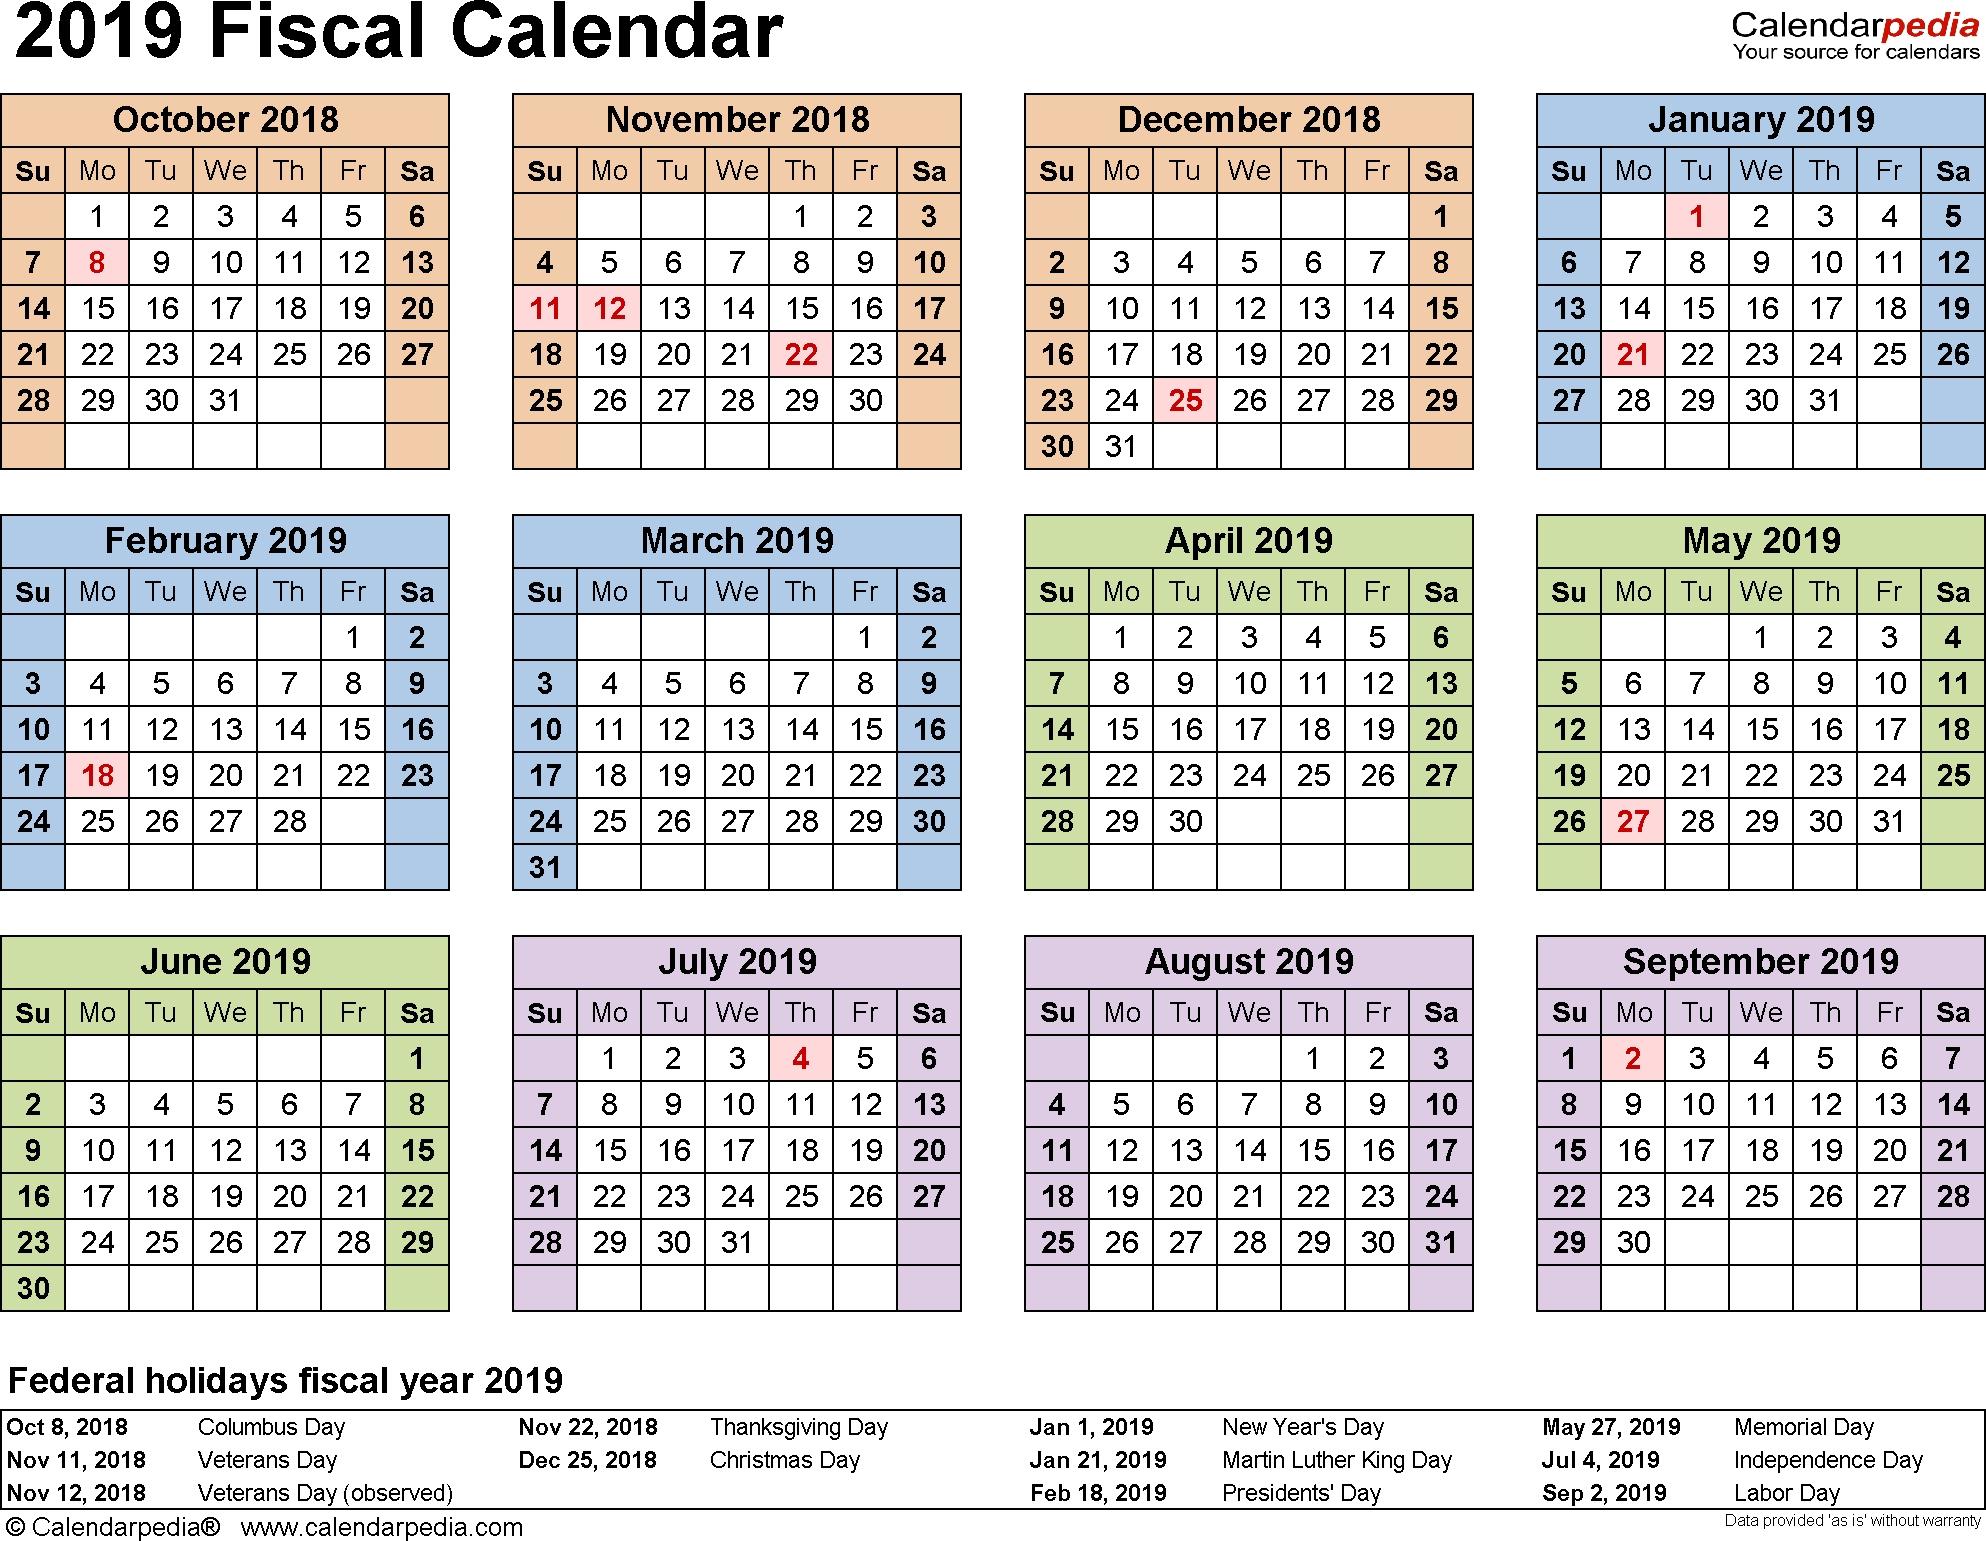 9/80 Work Schedule Calendar 2020